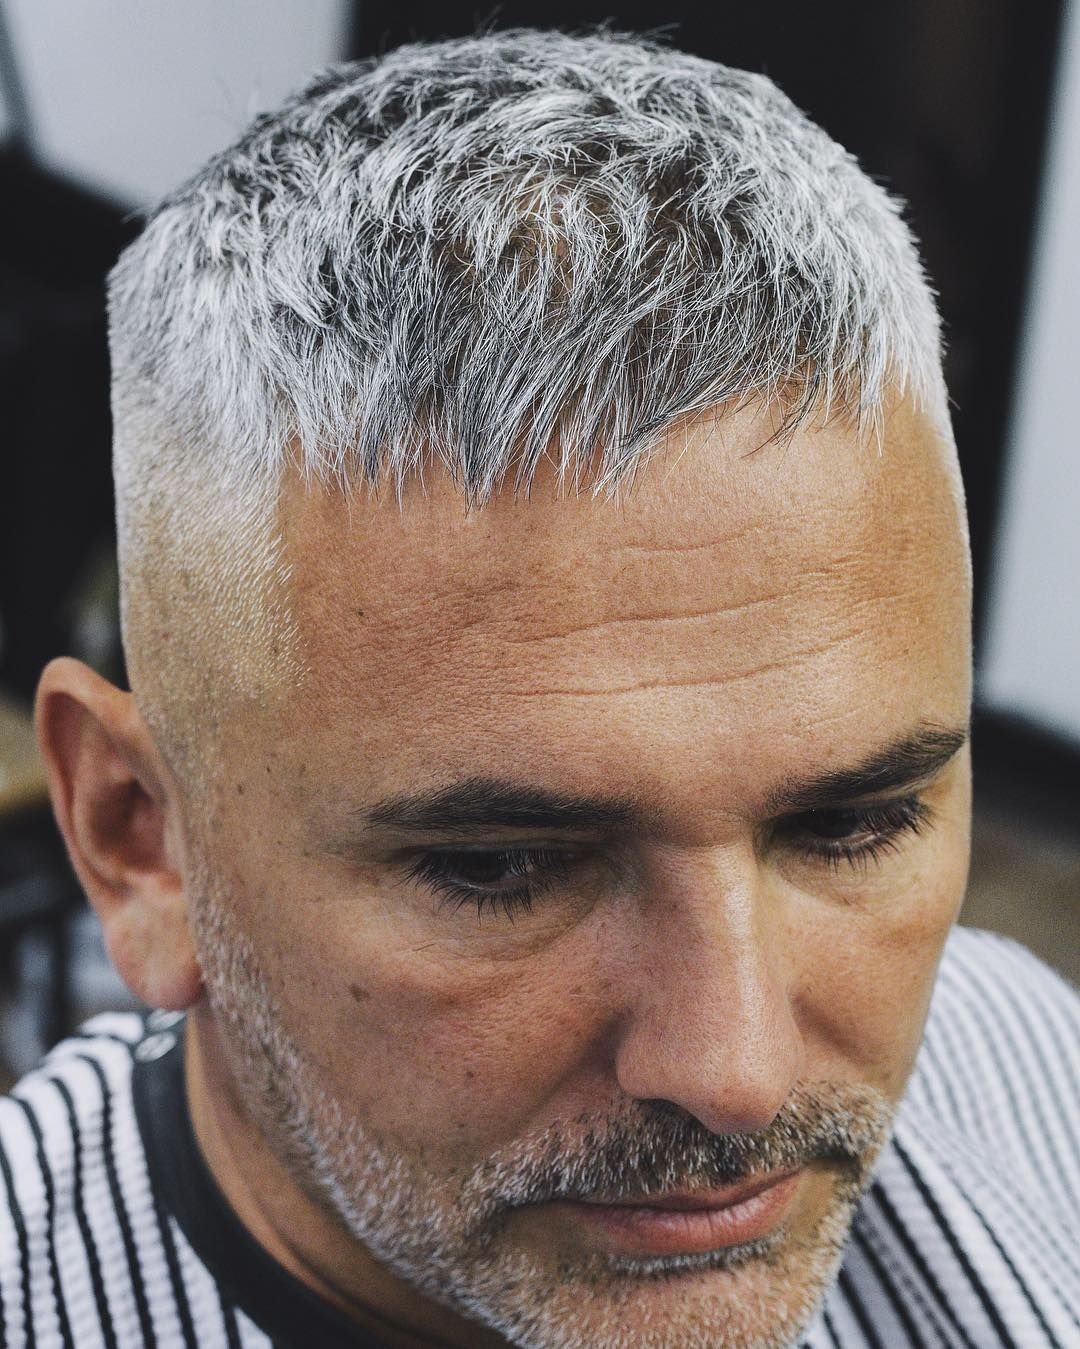 Hairstyles For Older Men That Look Great Older Mens Hairstyles